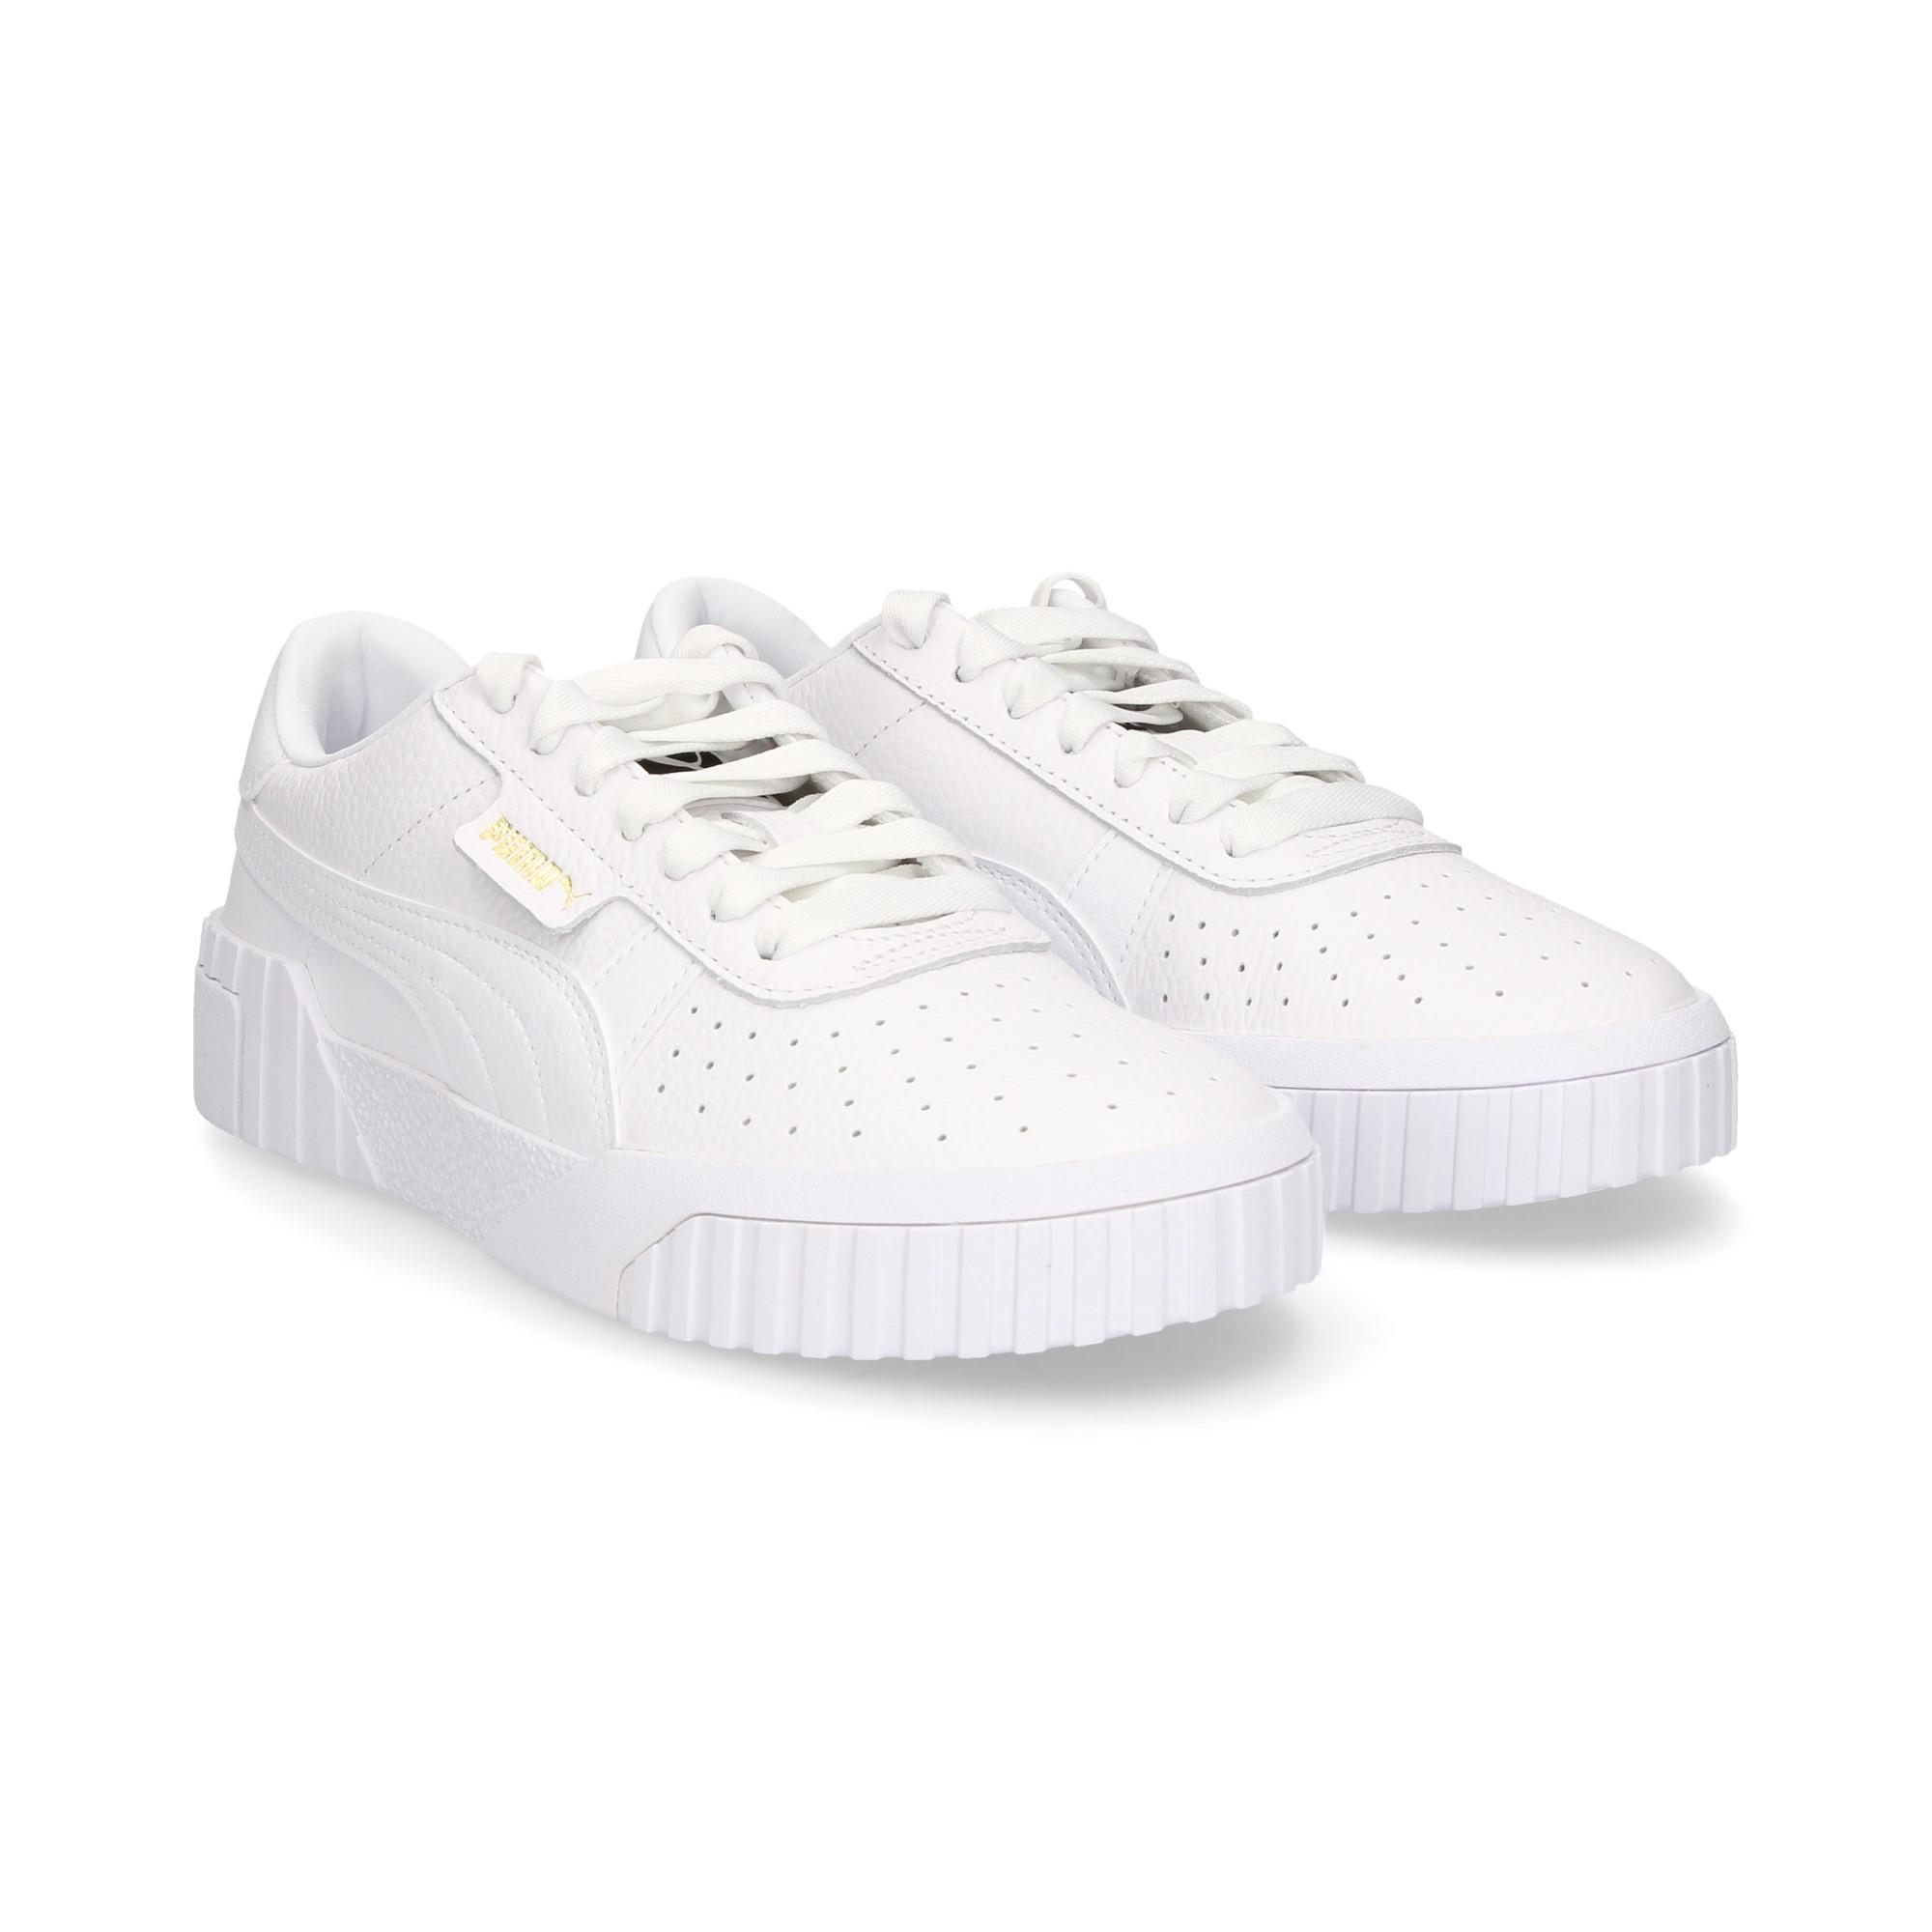 PUMA Women's Sneakers 369155 01 BLANCO